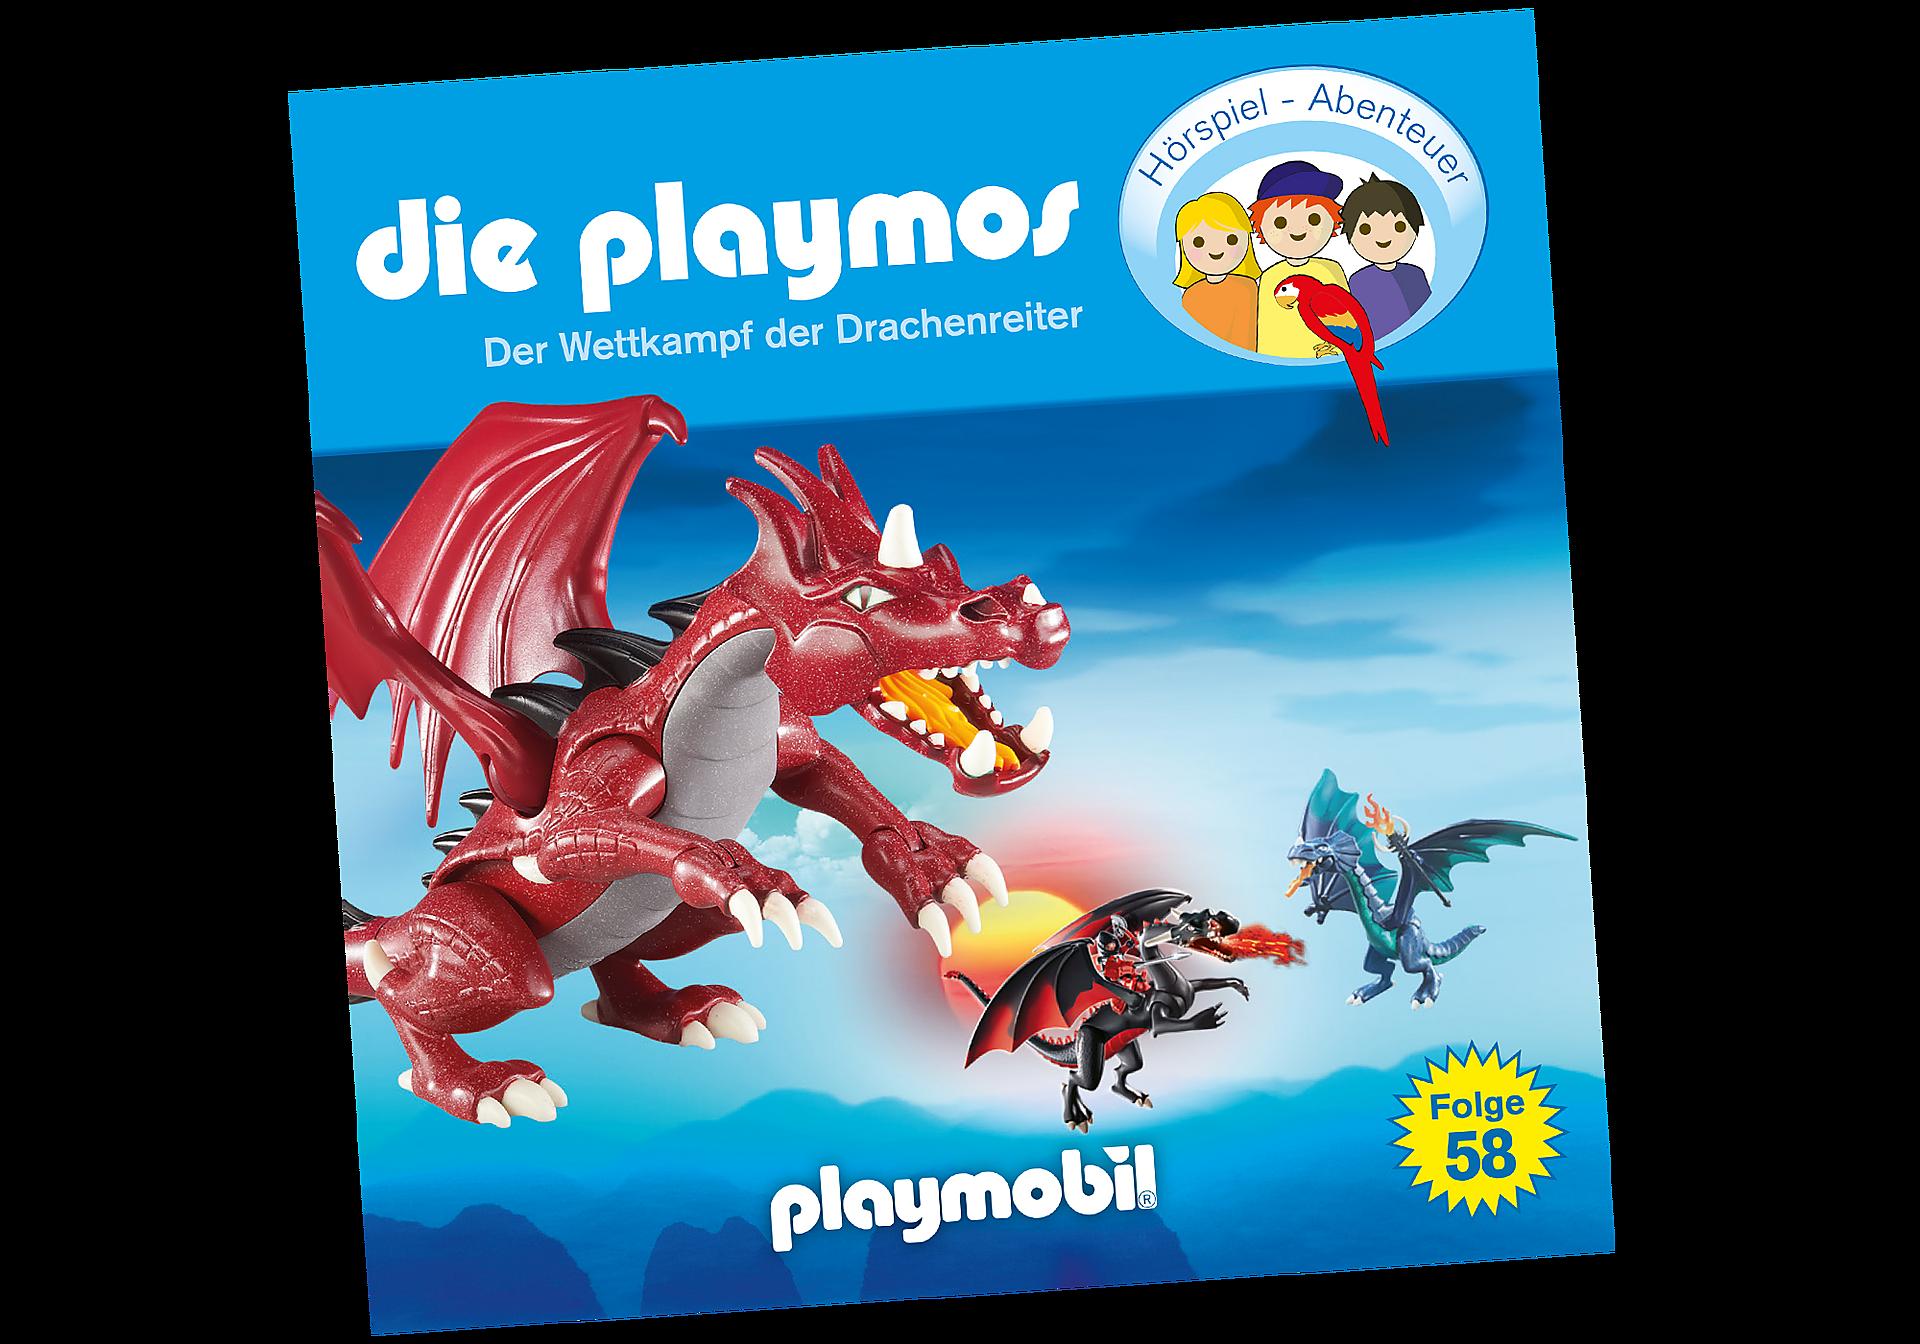 http://media.playmobil.com/i/playmobil/80041_product_detail/Der Wettkampf der Drachenreiter - Folge 58